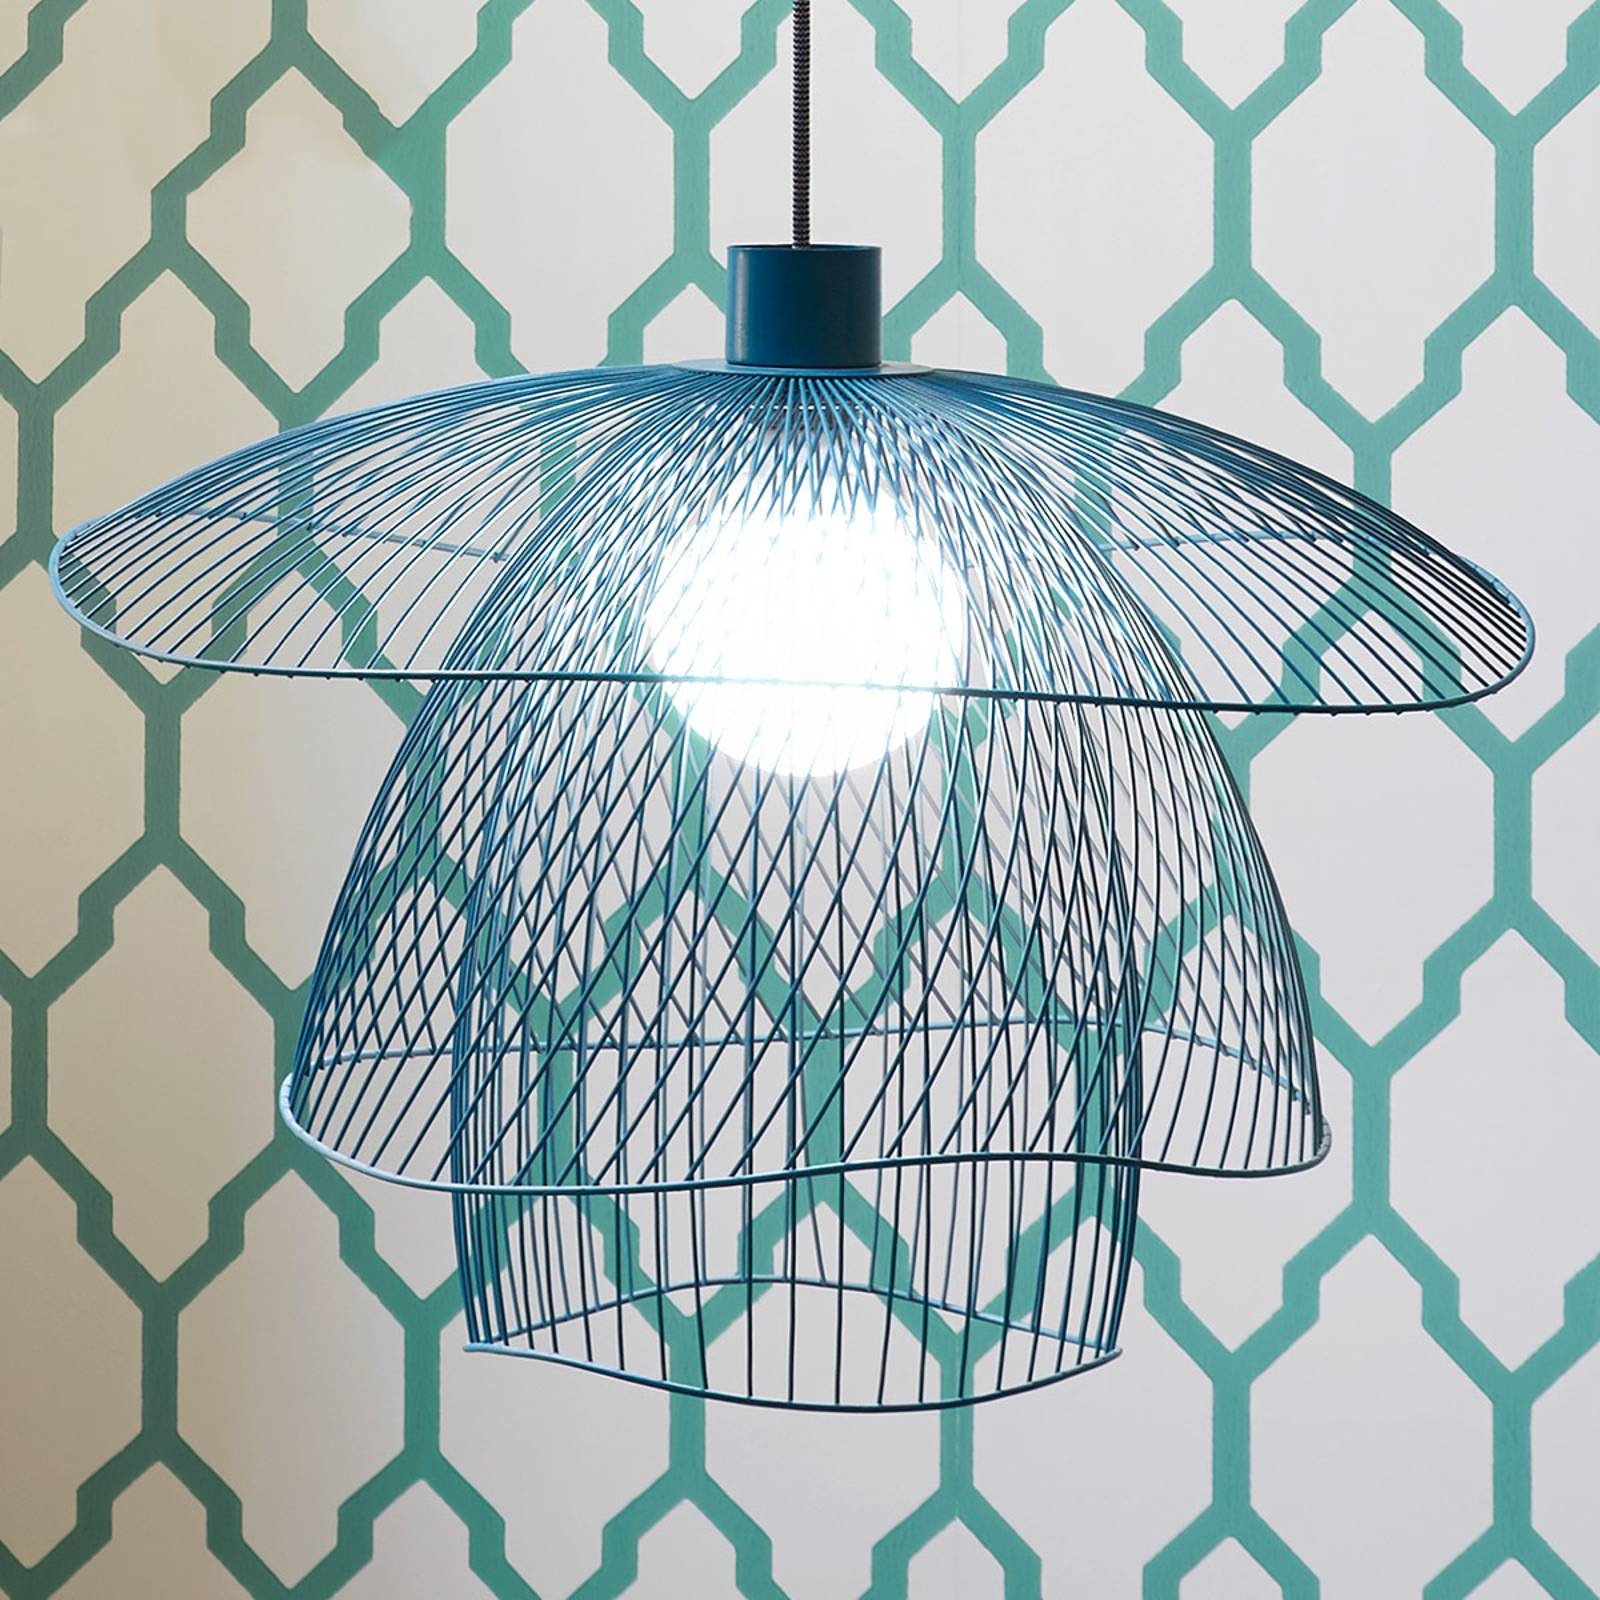 Forestier Papillon S lampa wisząca 56 cm niebieska